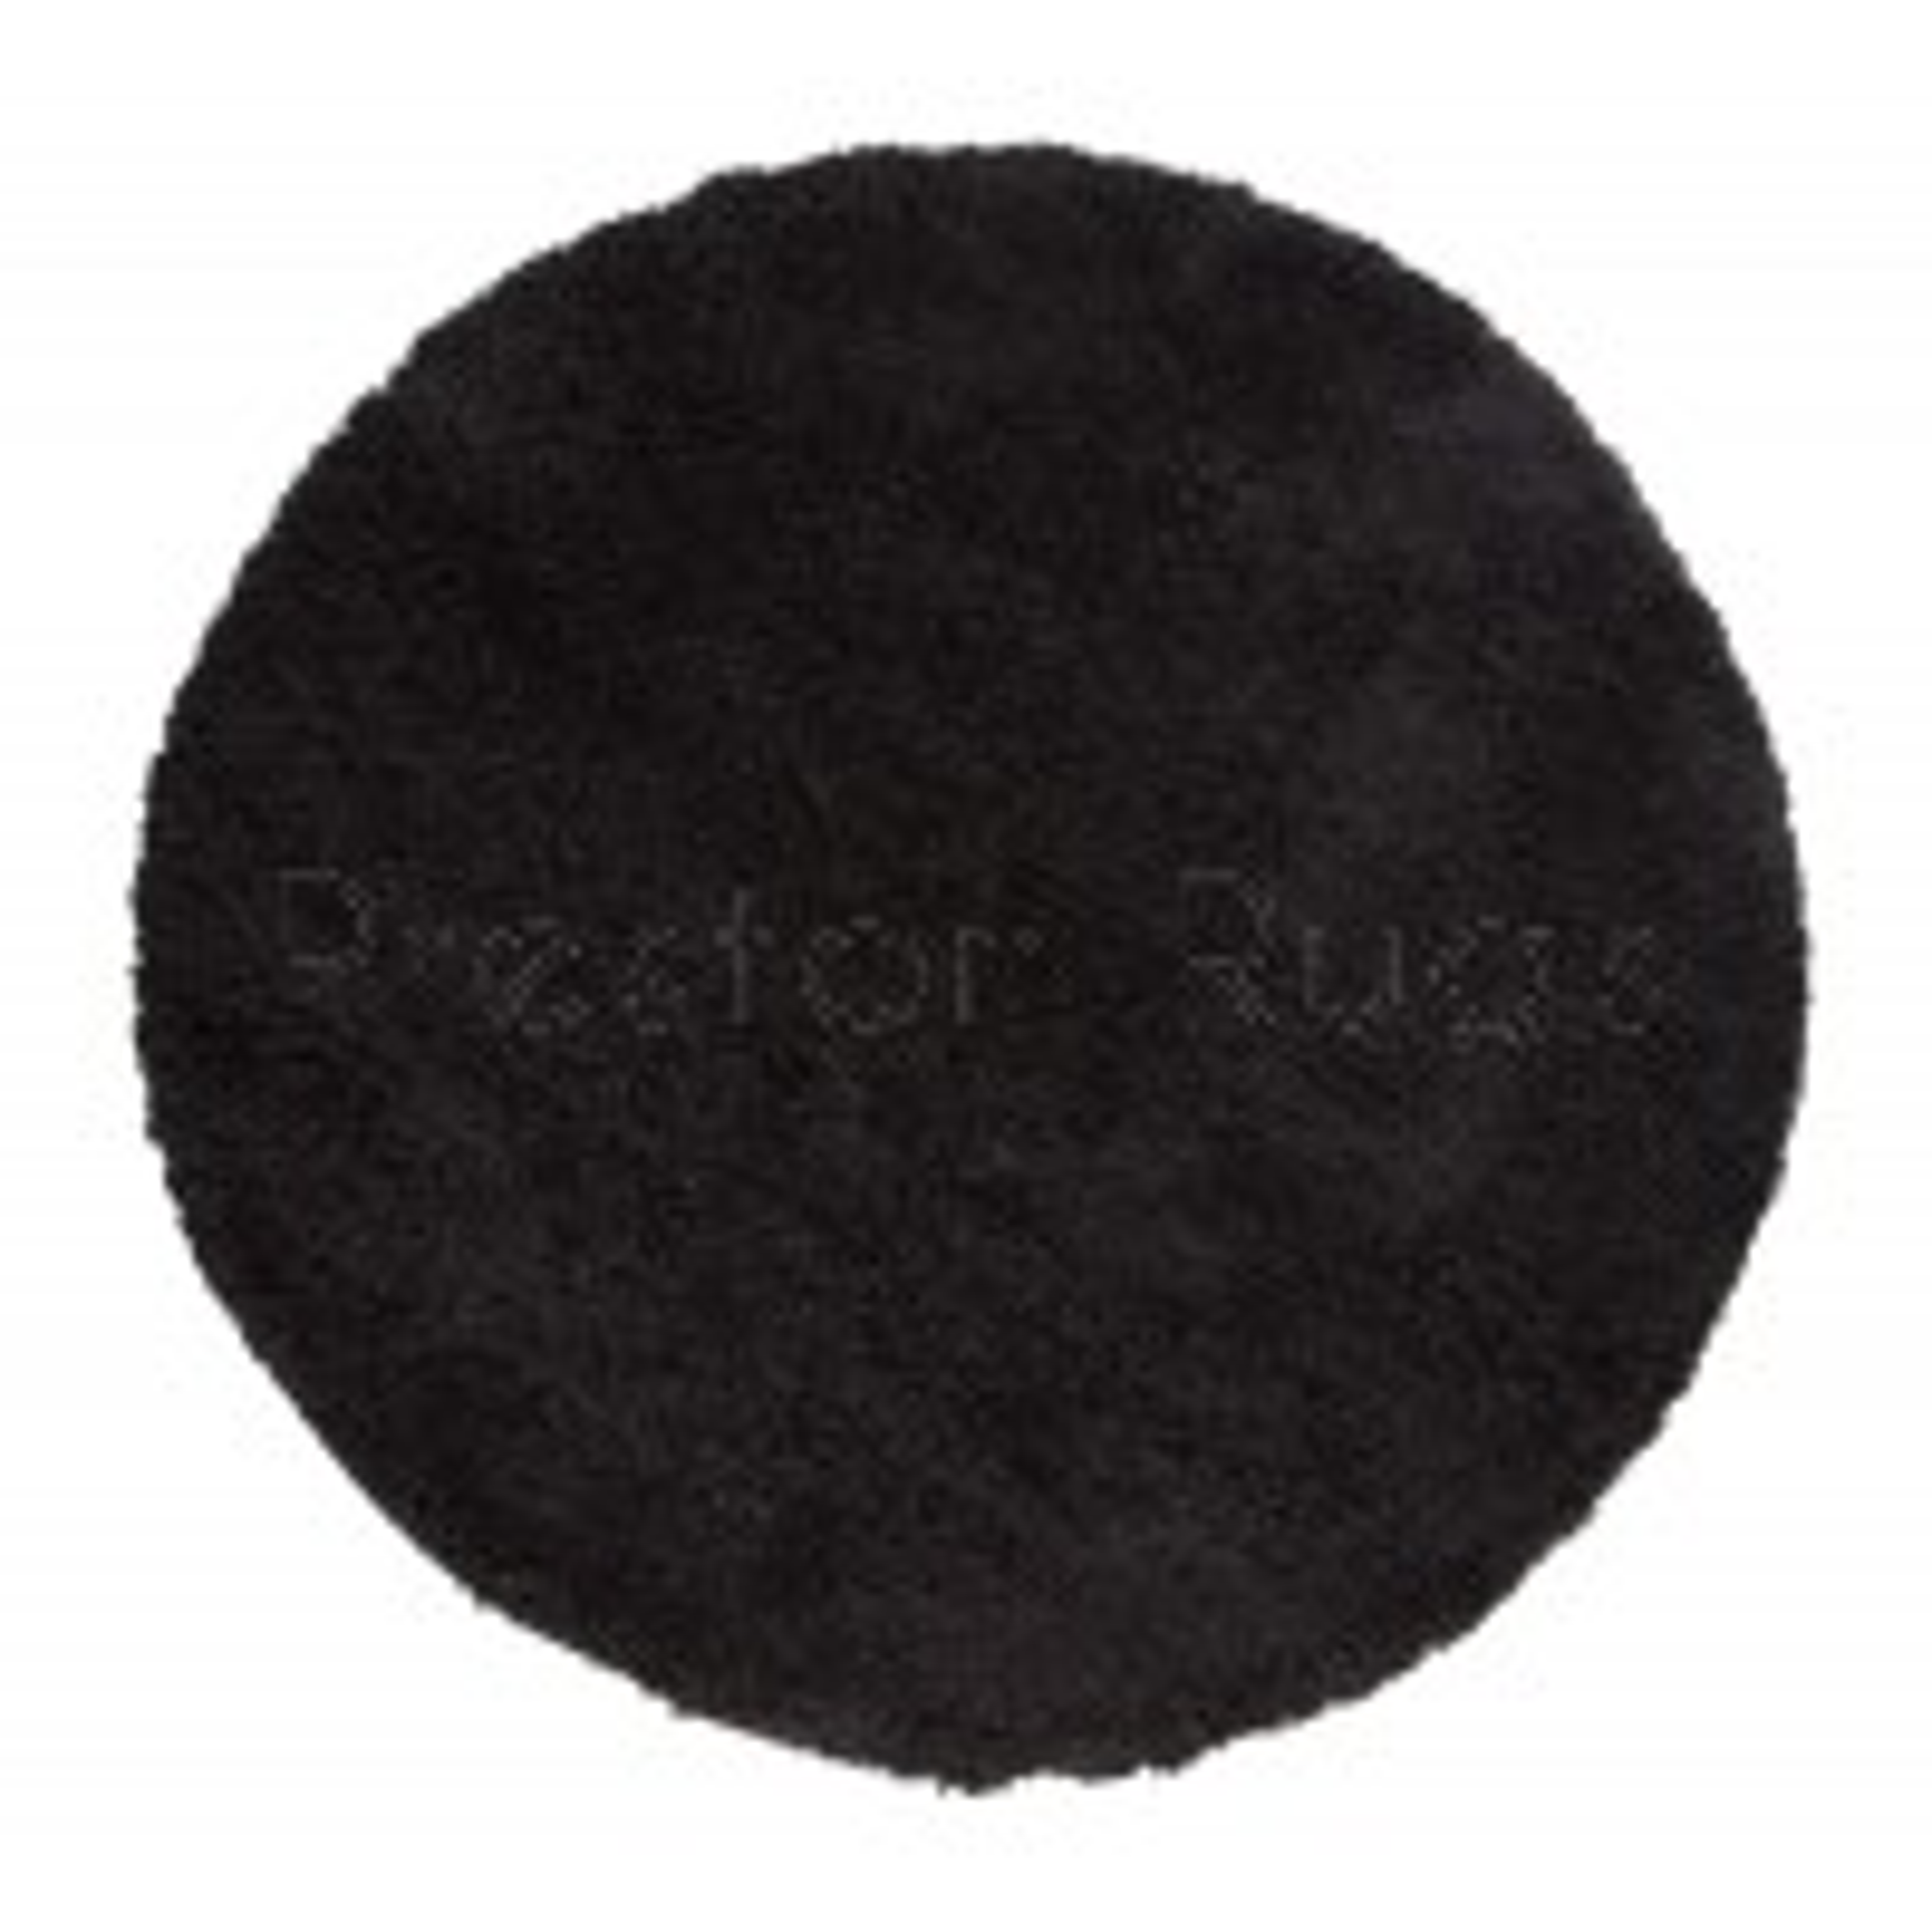 "Nordic Cariboo Shaggy Rug - Black - Size Circle 133 cm (4'4"")"